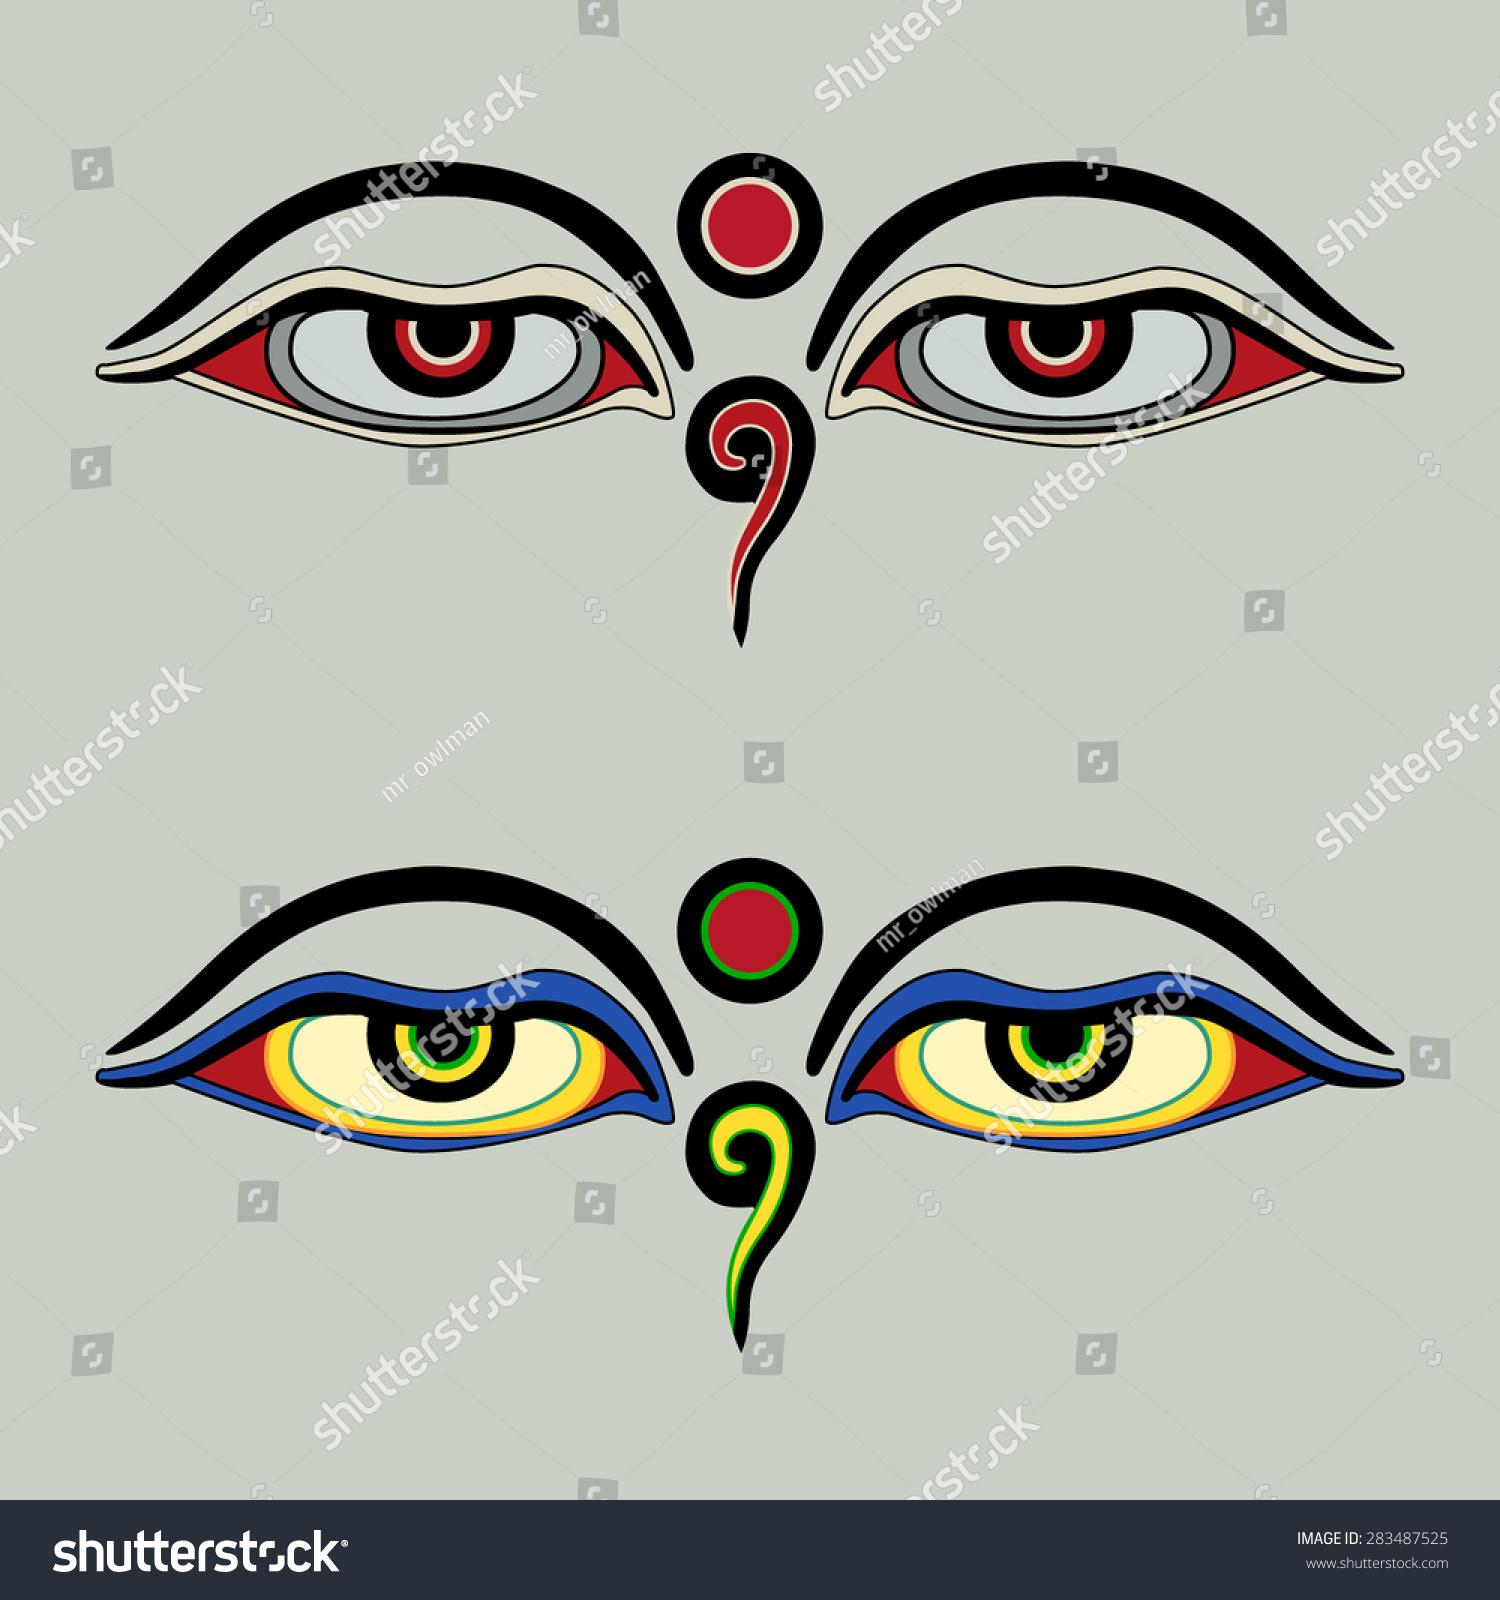 Eyes buddha buddhas eyes buddhist eyes stock vector 283487525 eyes of buddha buddhas eyes buddhist eyes symbol wisdom enlightenment biocorpaavc Images